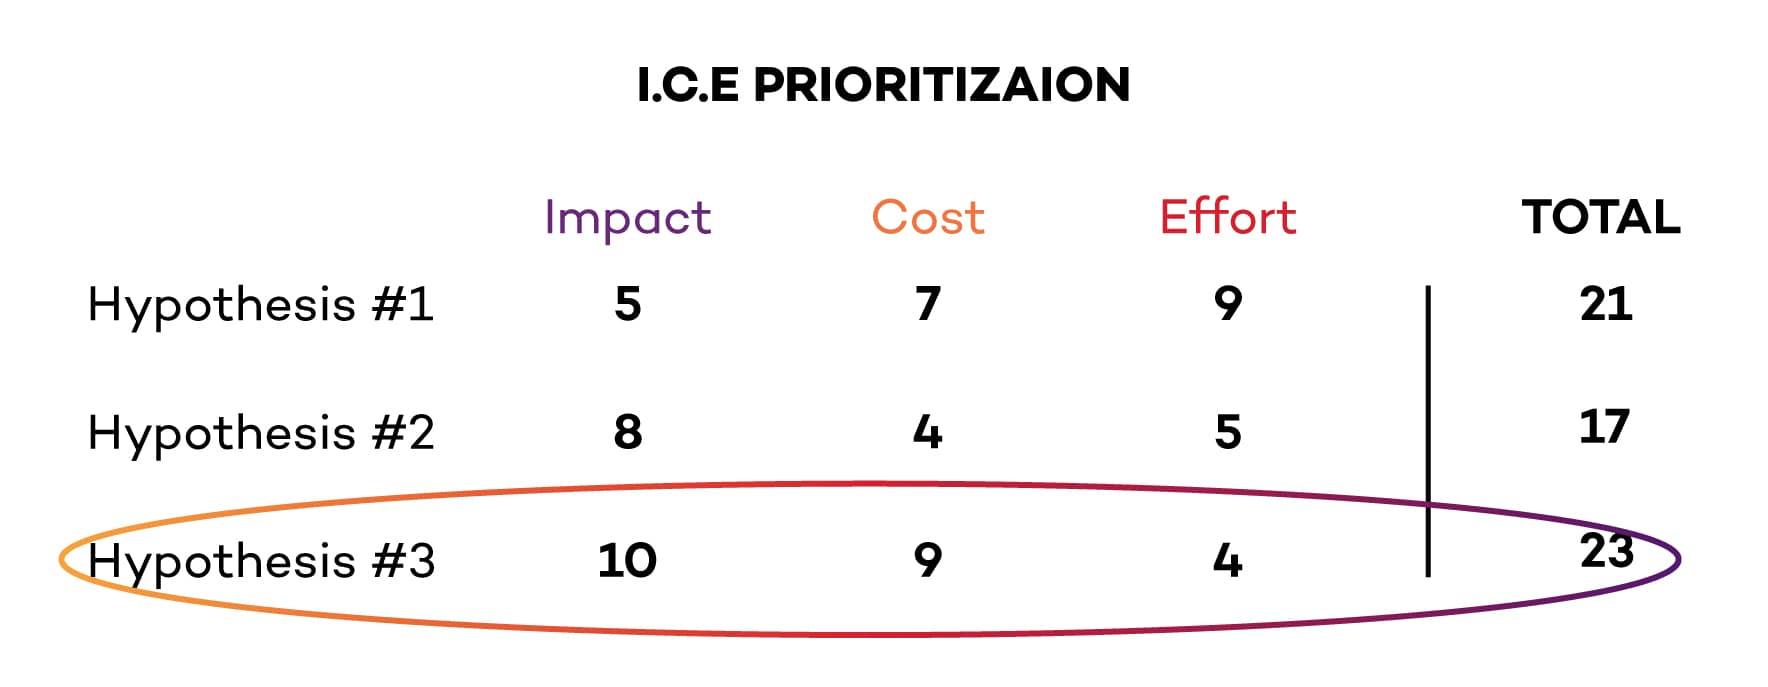 ICE-Prioritization-model-Example